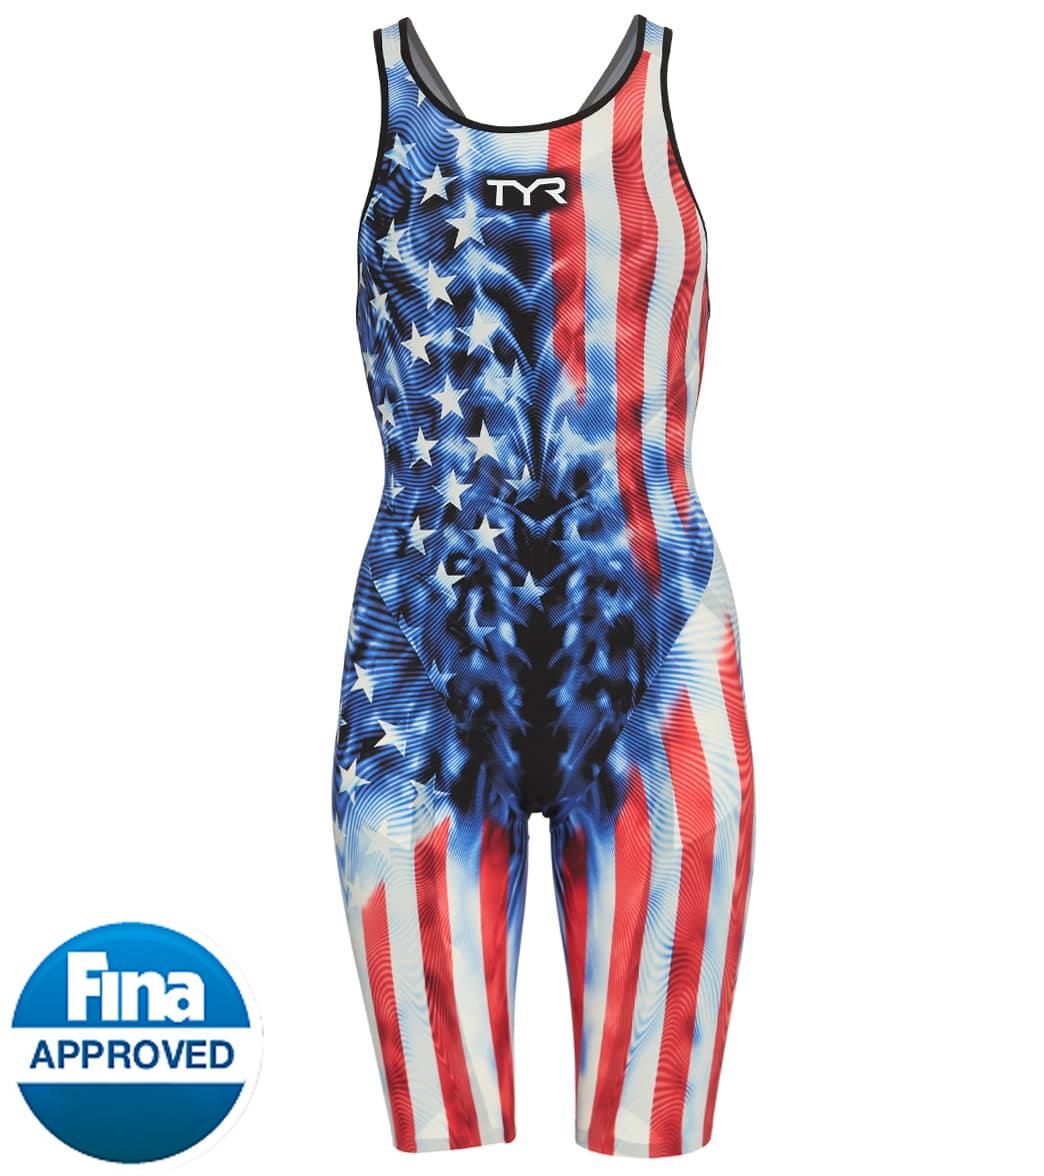 TYR Women's Venzo Genesis Usa Closed Back Tech Suit Swimsuit